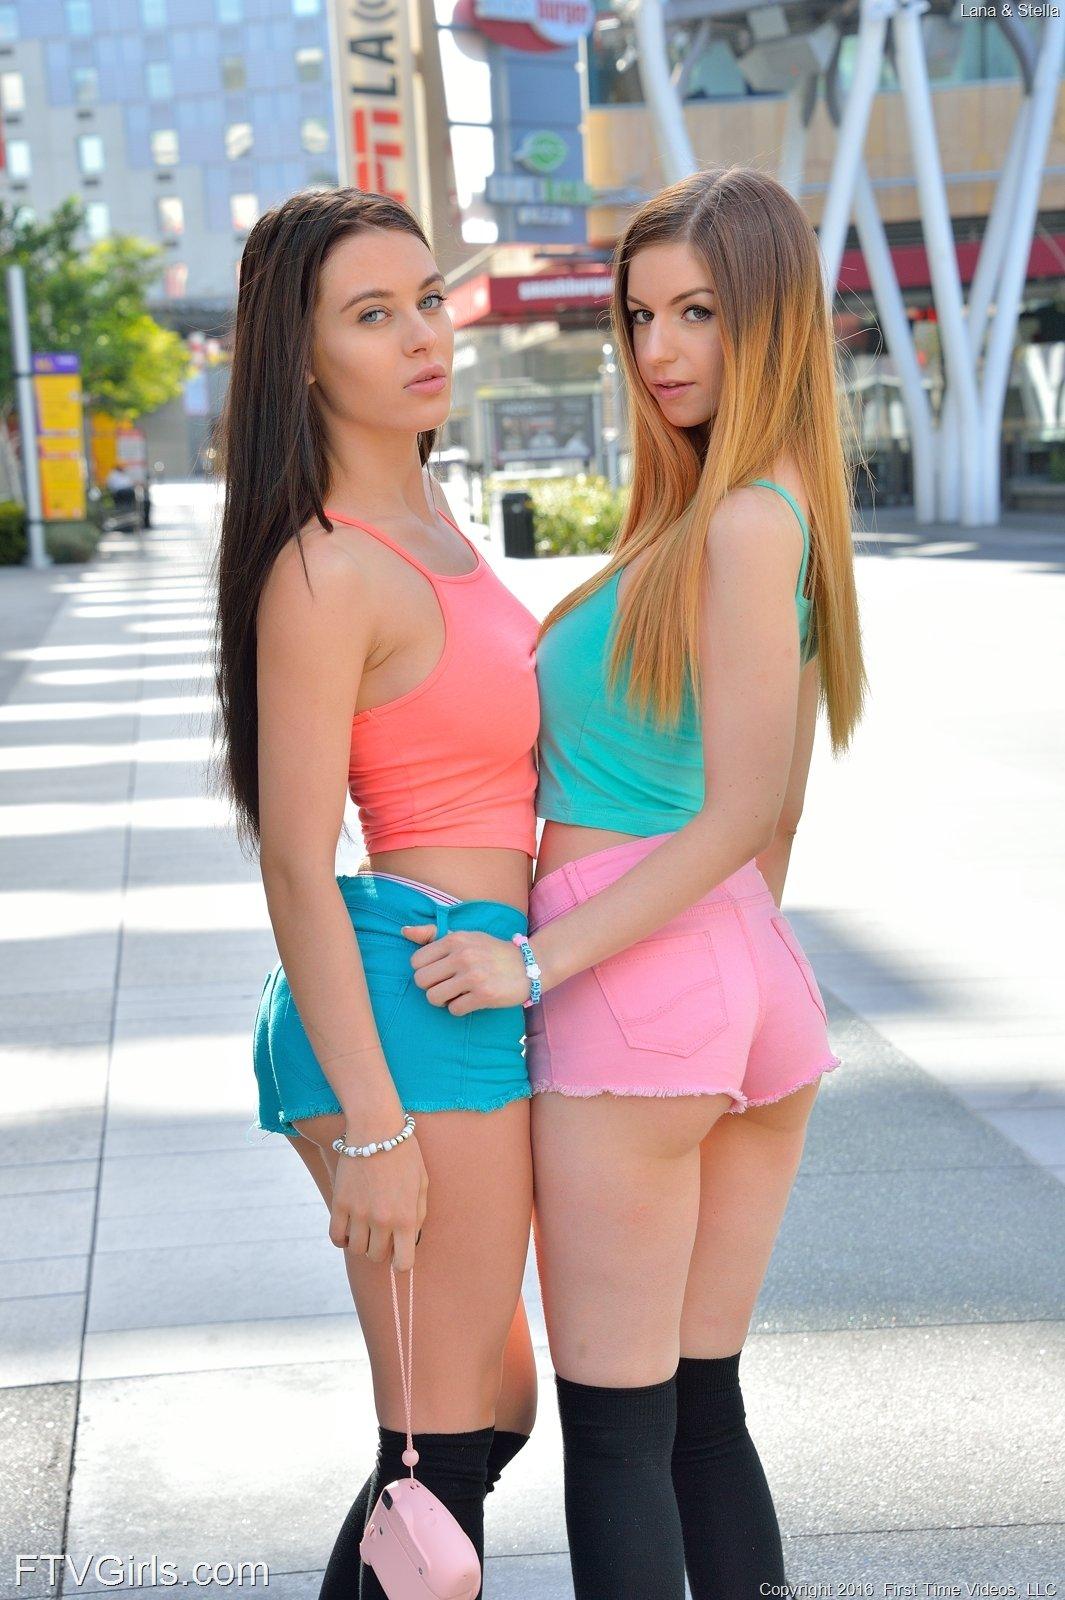 lana-stella-public-lesbian-shorts-nude-ftvgirls-05